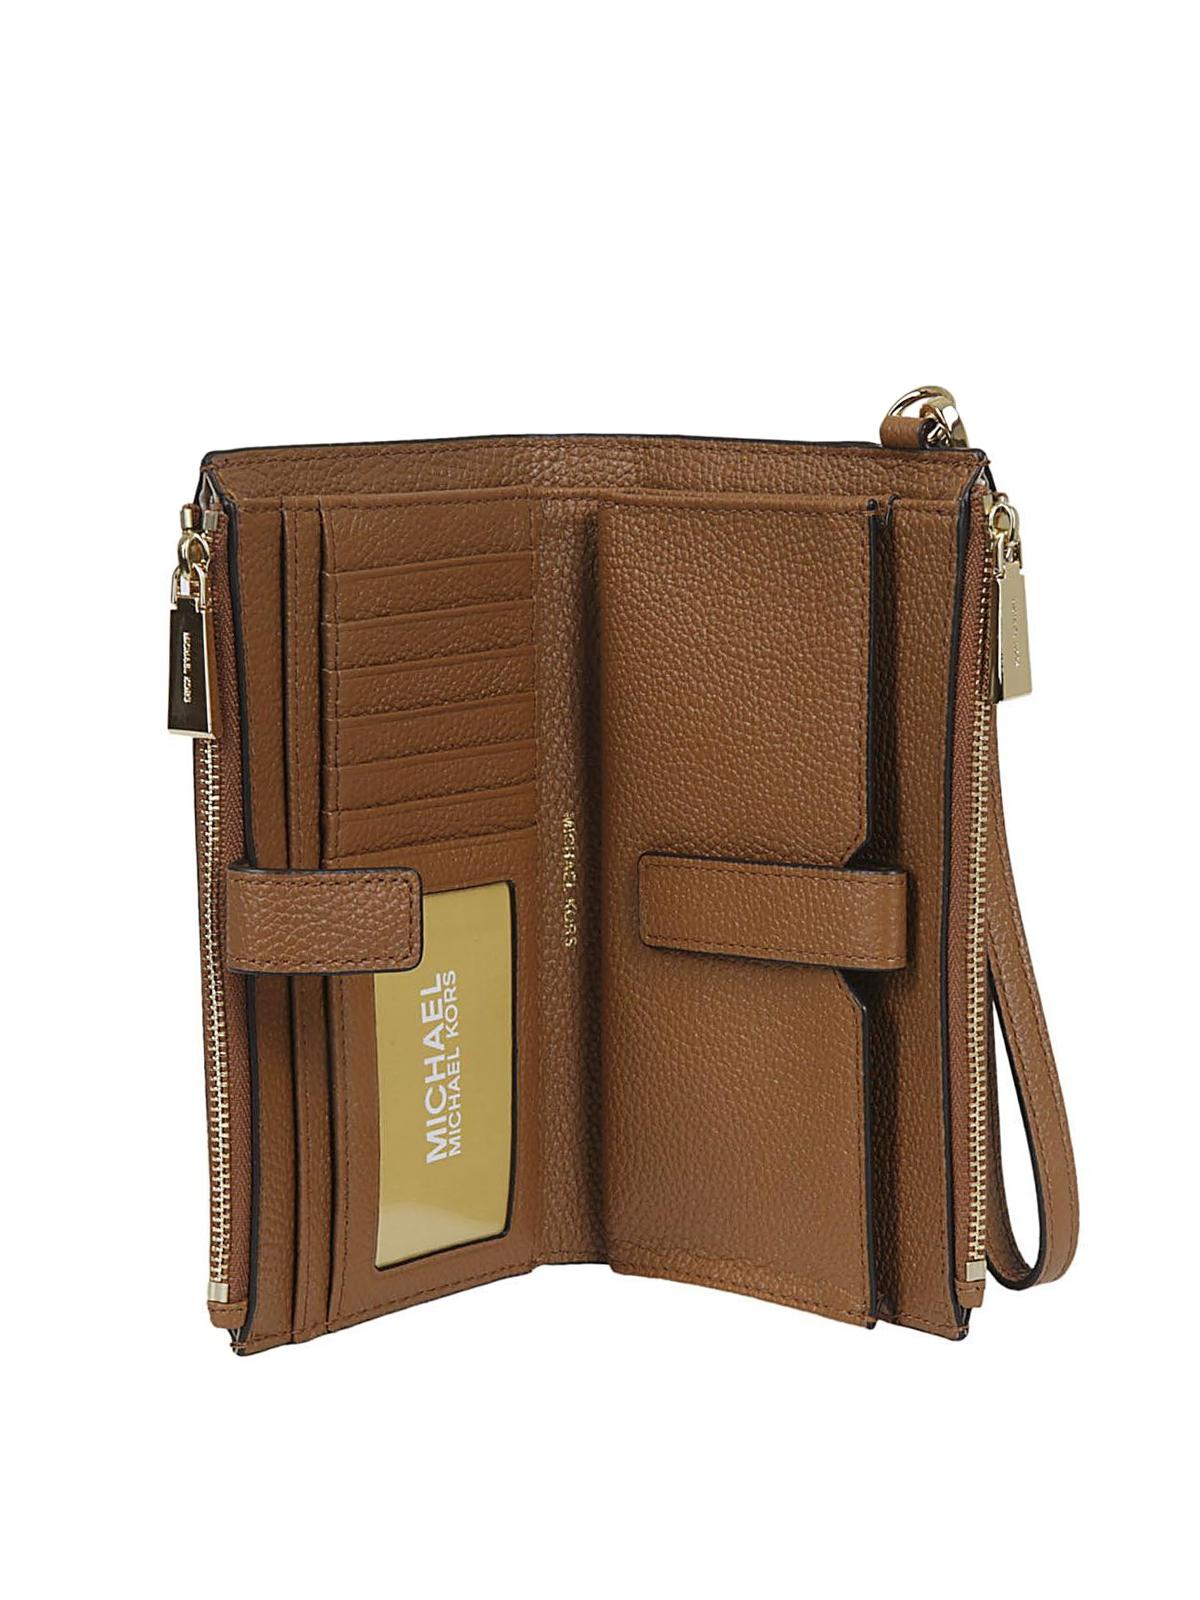 5c41c37bac3b Michael Kors - Adele acorn double zip wallet - wallets   purses ...